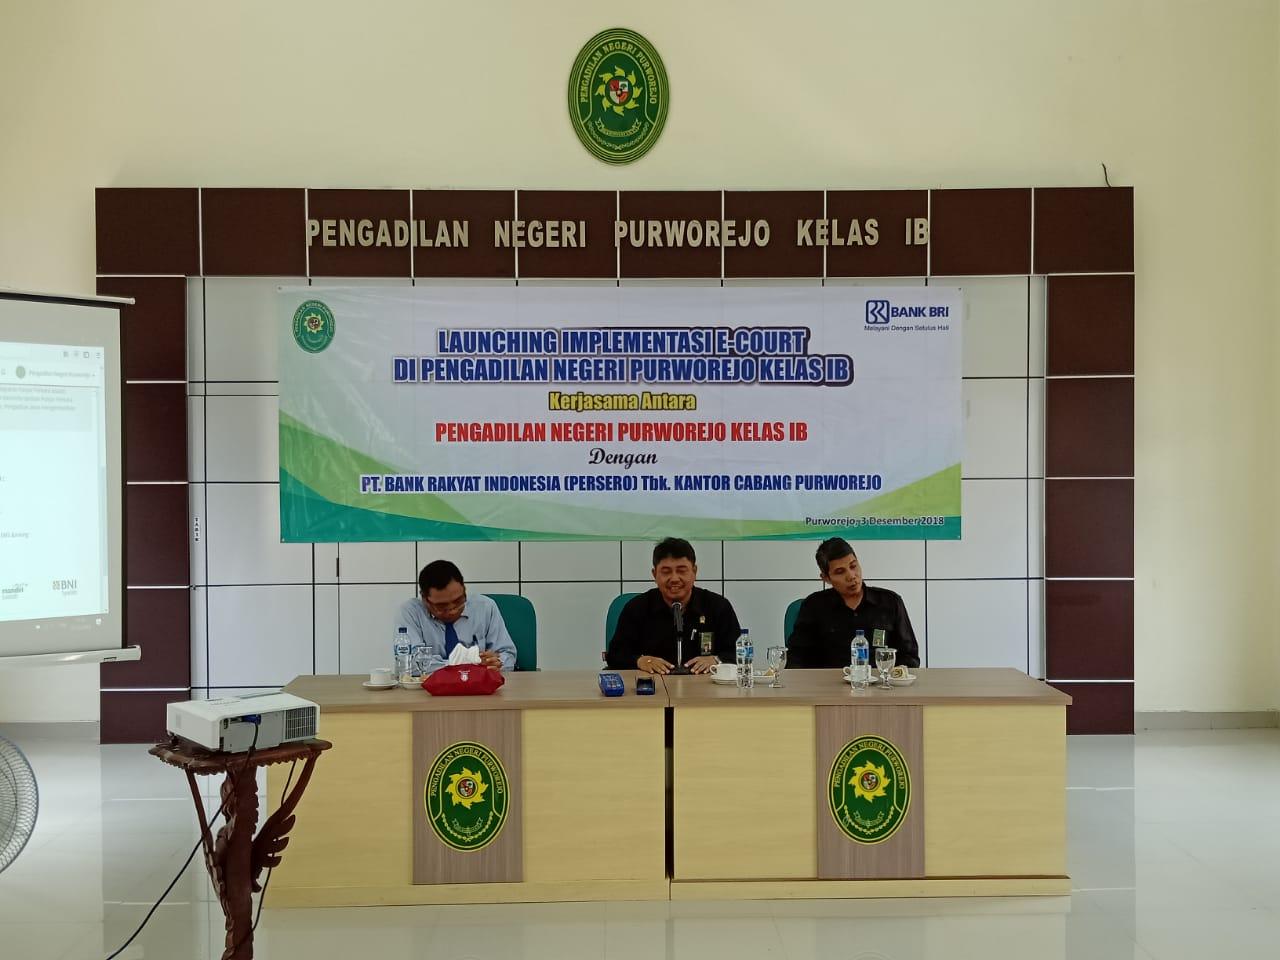 Pengadilan Negeri Purworejo Laounching Implementasi E-Court  kerjasama dengan PT. Bank Rakyat Indonesia (Persero) Purworejo